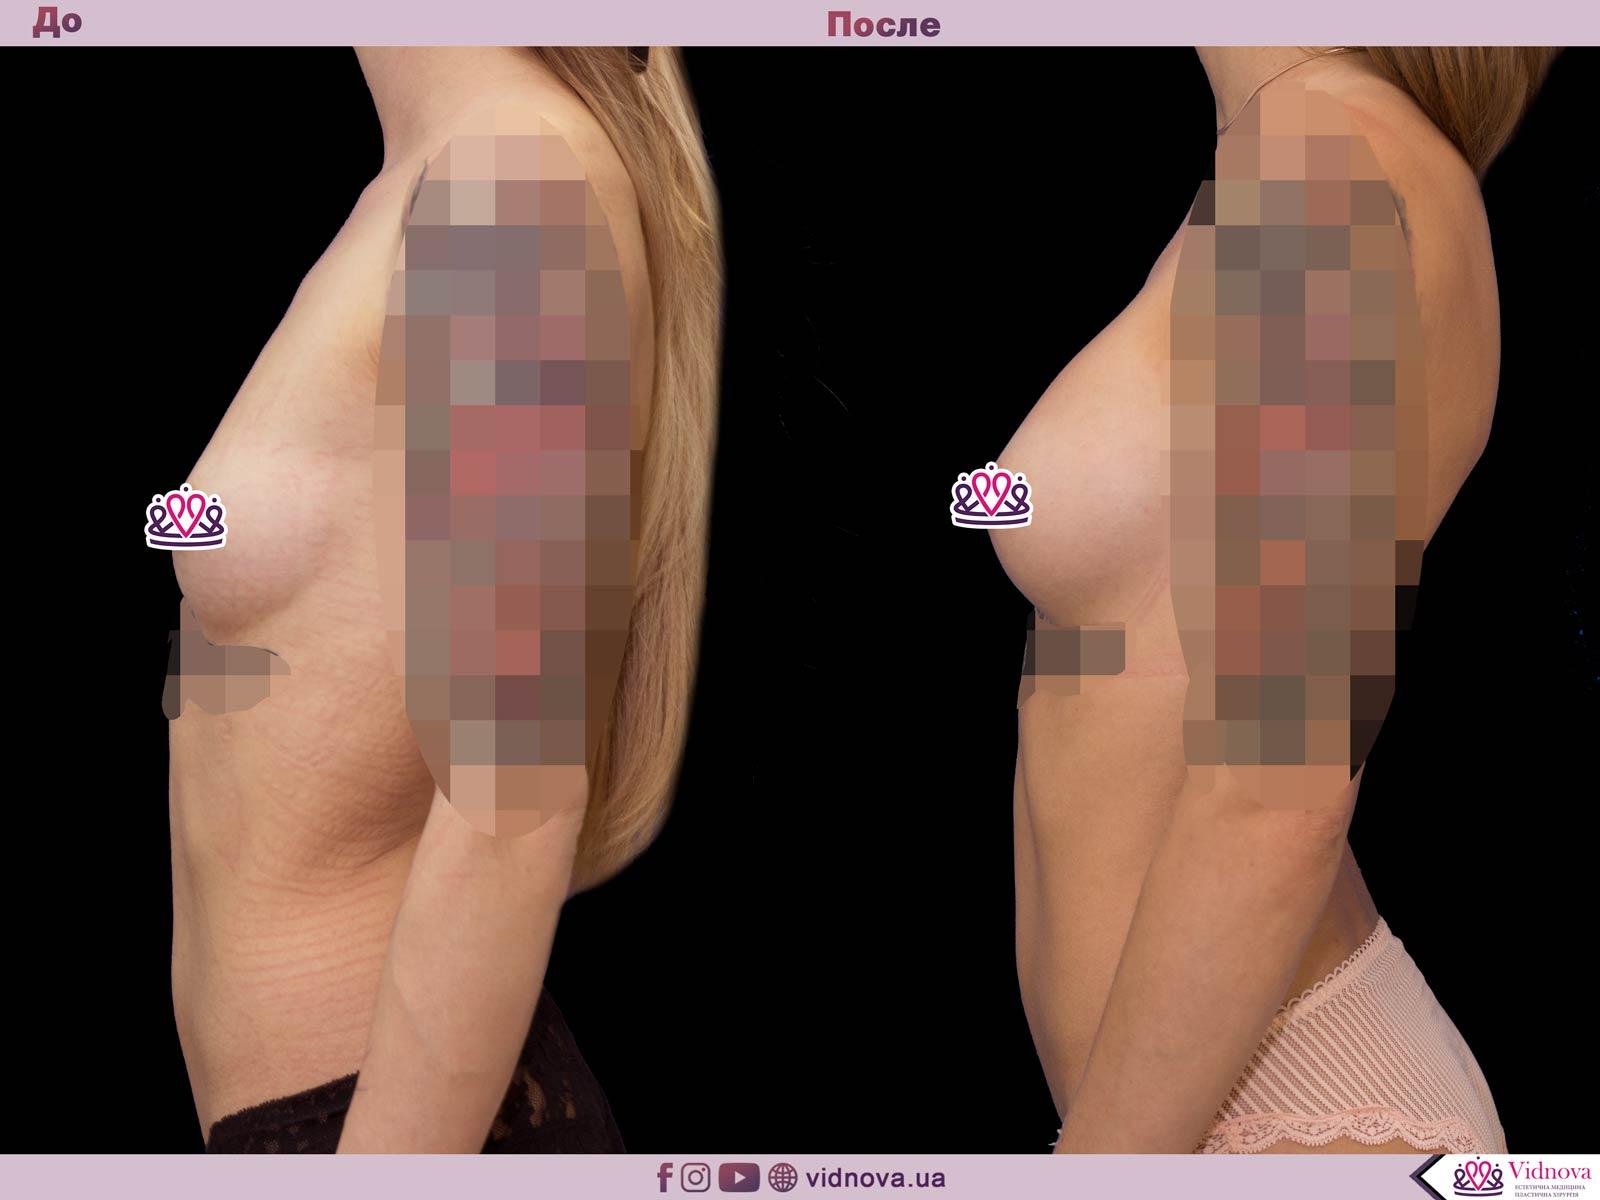 Увеличение груди: Фото ДО и ПОСЛЕ - Пример №43-3 - Клиника Vidnova